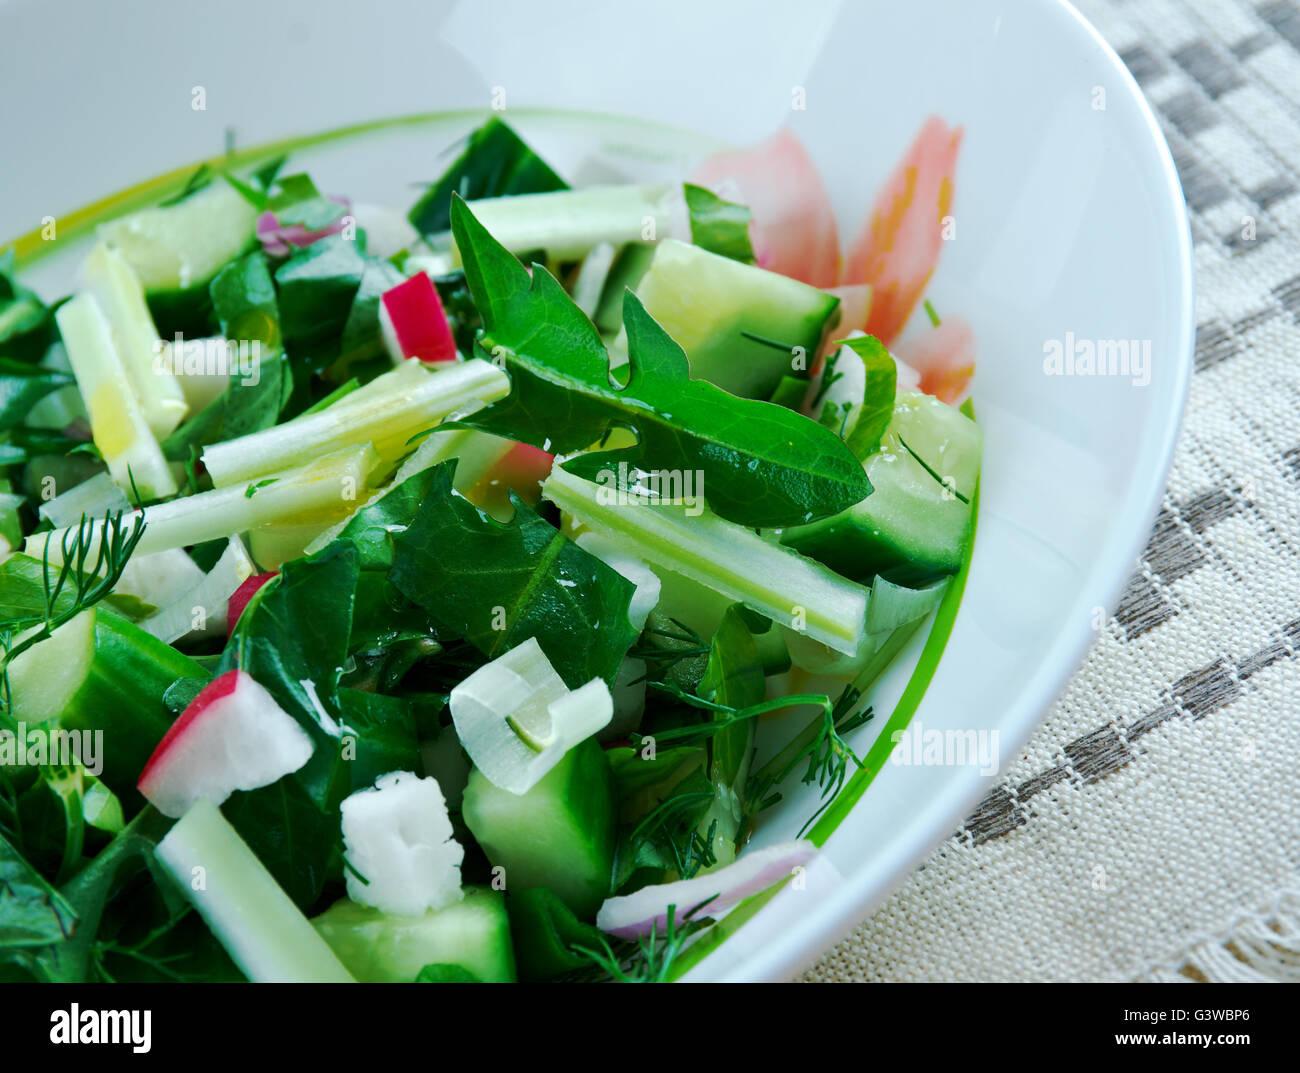 Traditional Slavic spring salad of dandelions - Stock Image